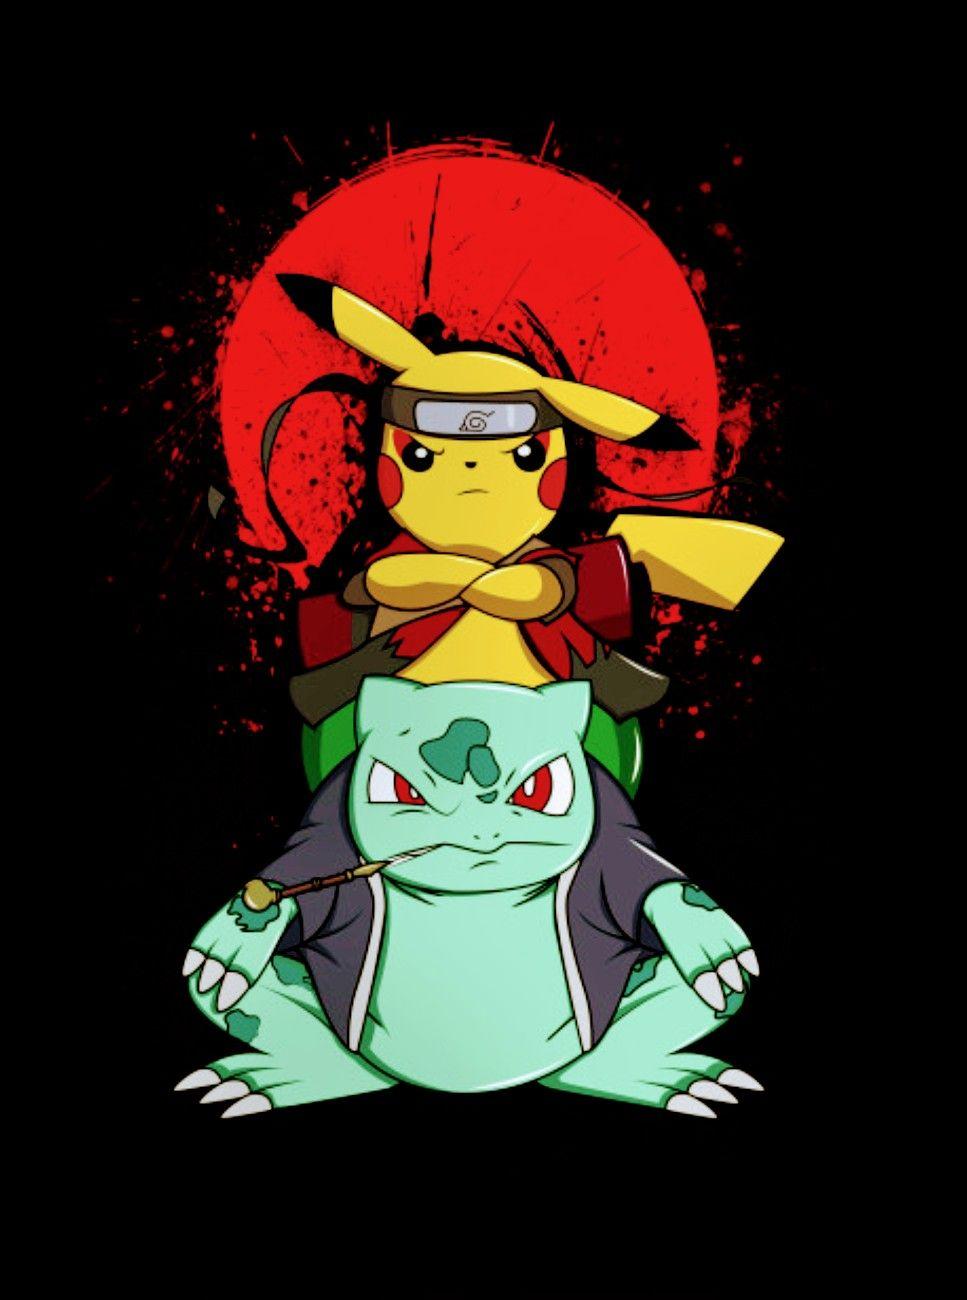 Nintendo Wallpaper Iphone X Pikachu Amp Bulbasaur Naruto Pokemon Pokemon Pokemon